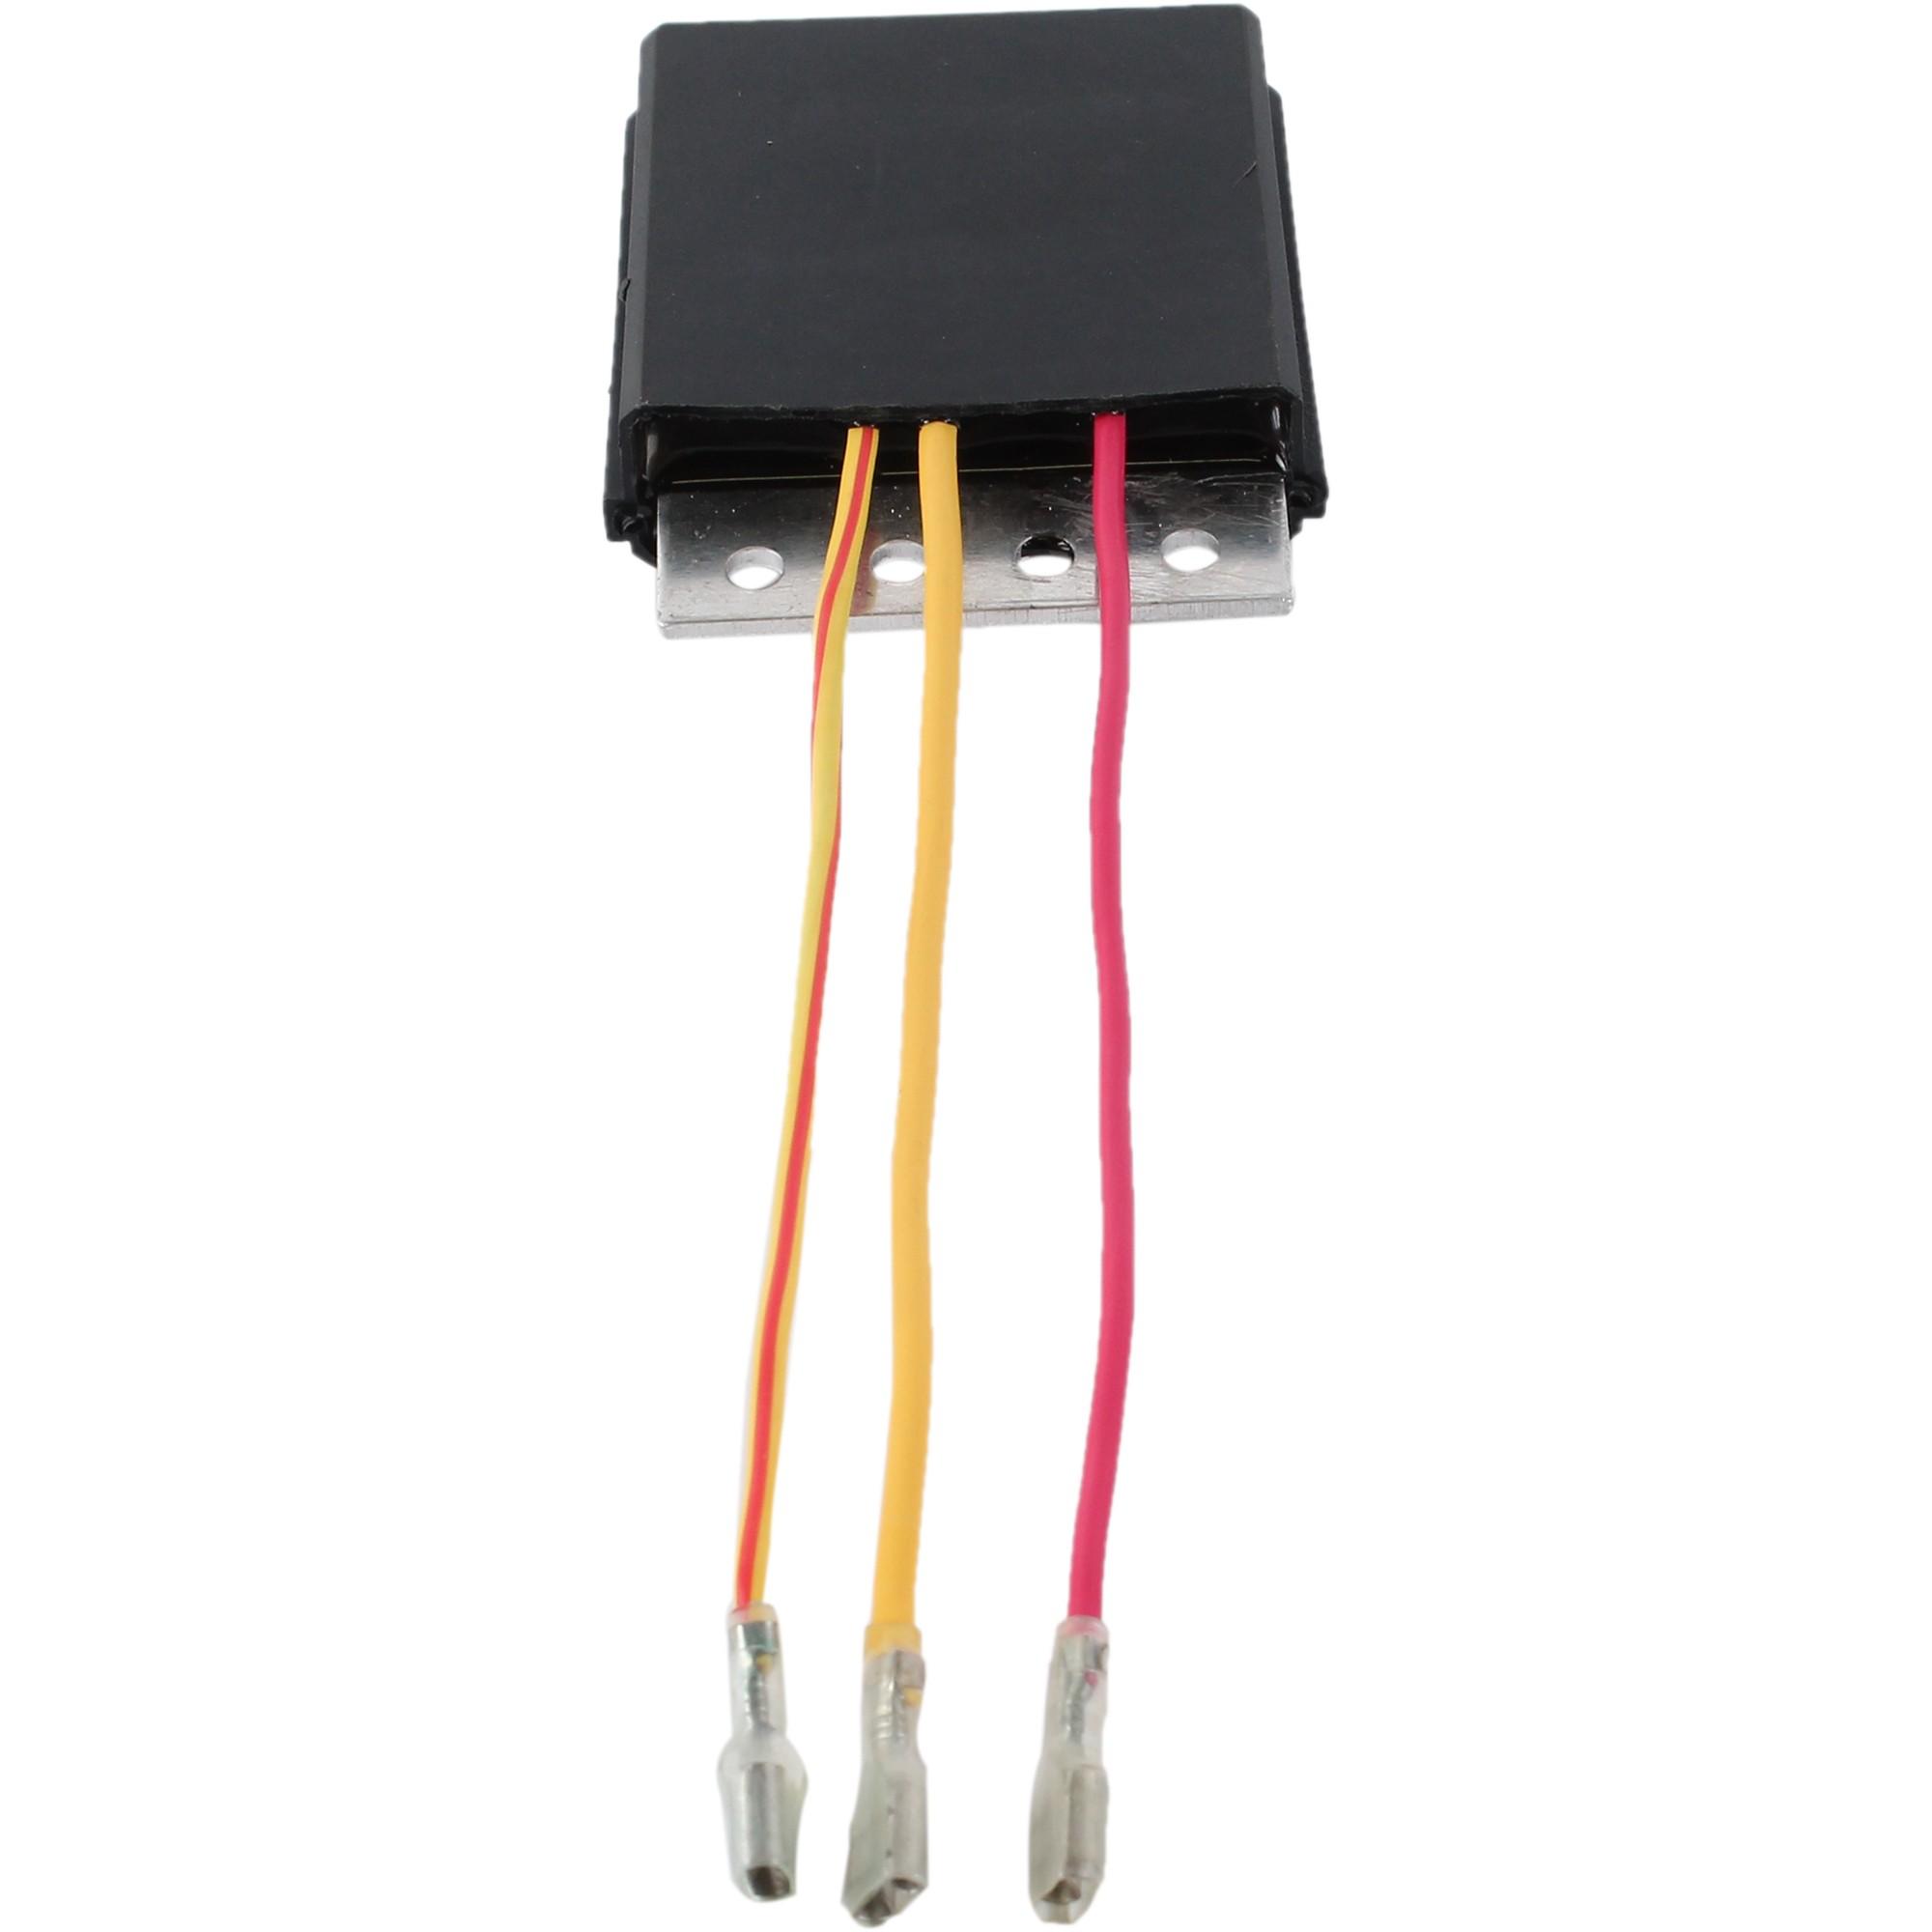 4060193 New Voltage Regulator Rectifier 12V For Polaris 1998-99 Scrambler 400